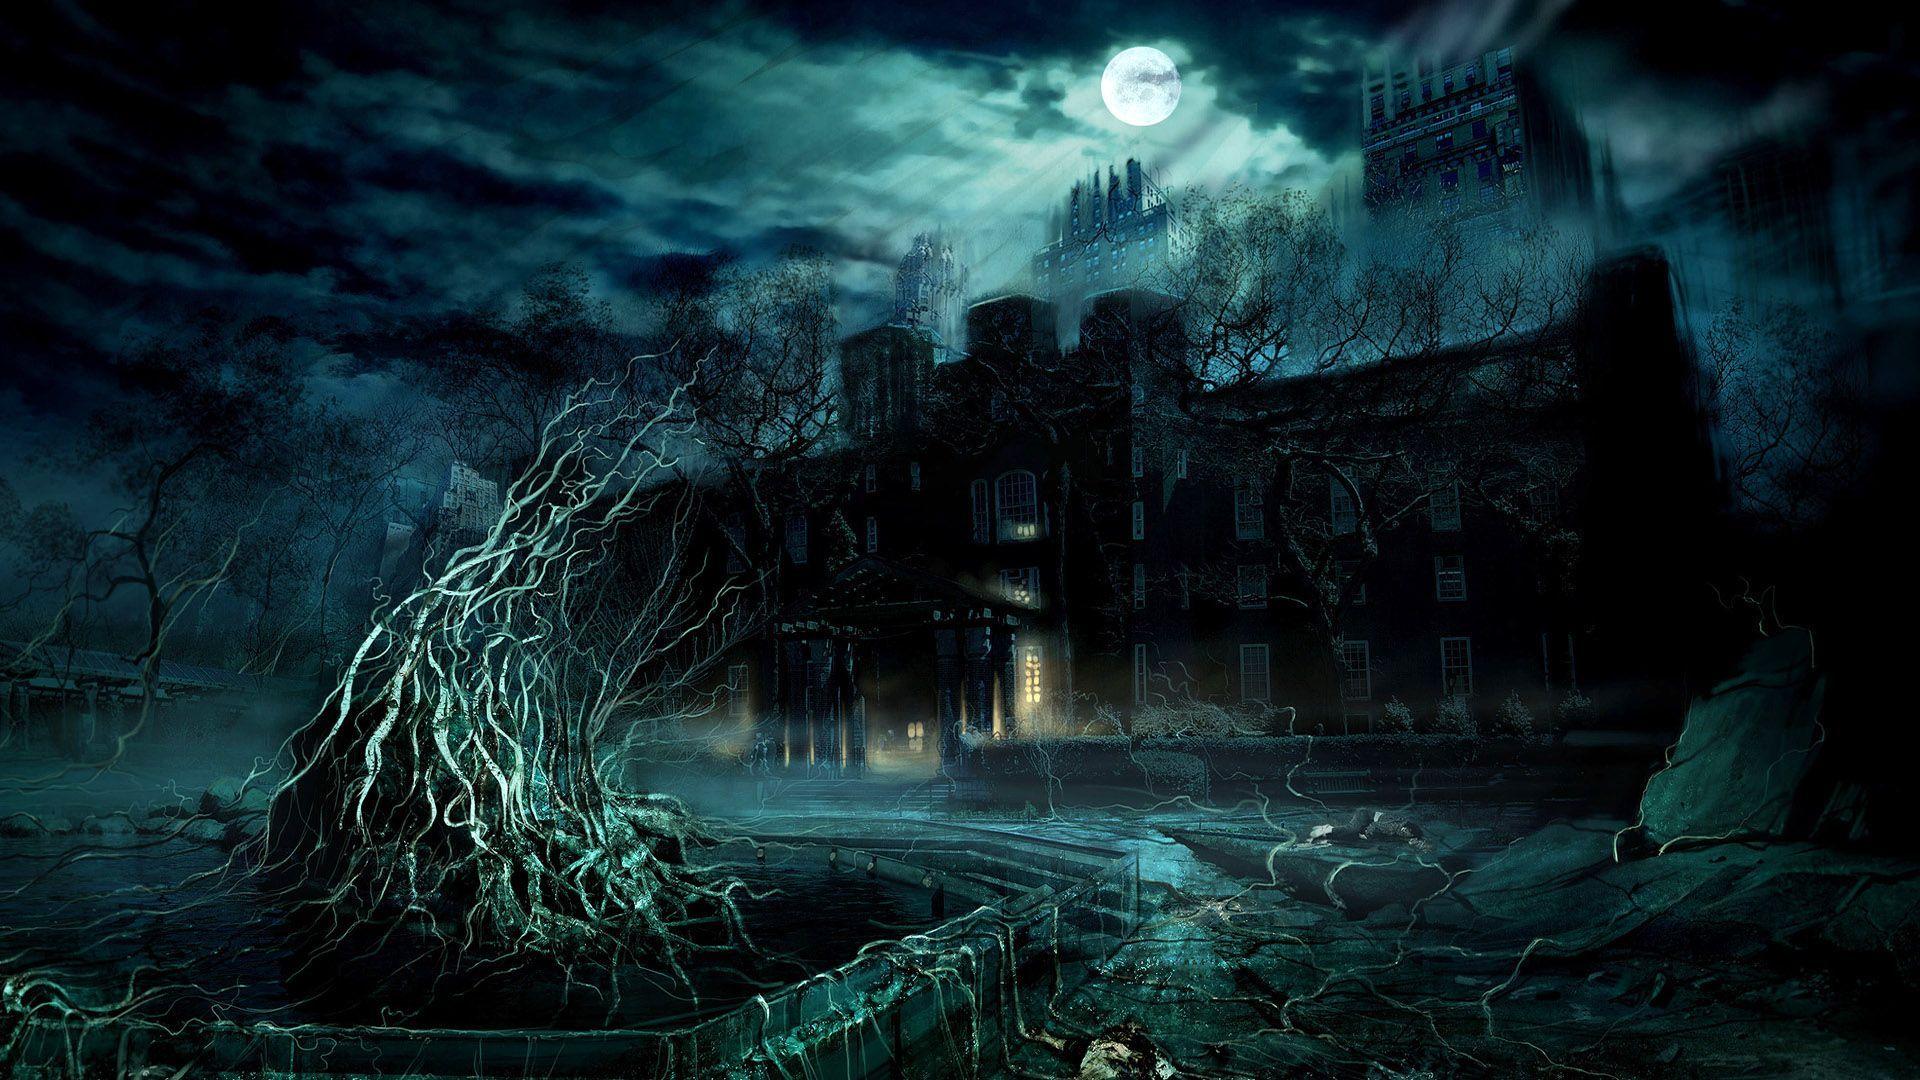 Dark Fantasy Desktop Backgrounds Posted By Christopher Peltier